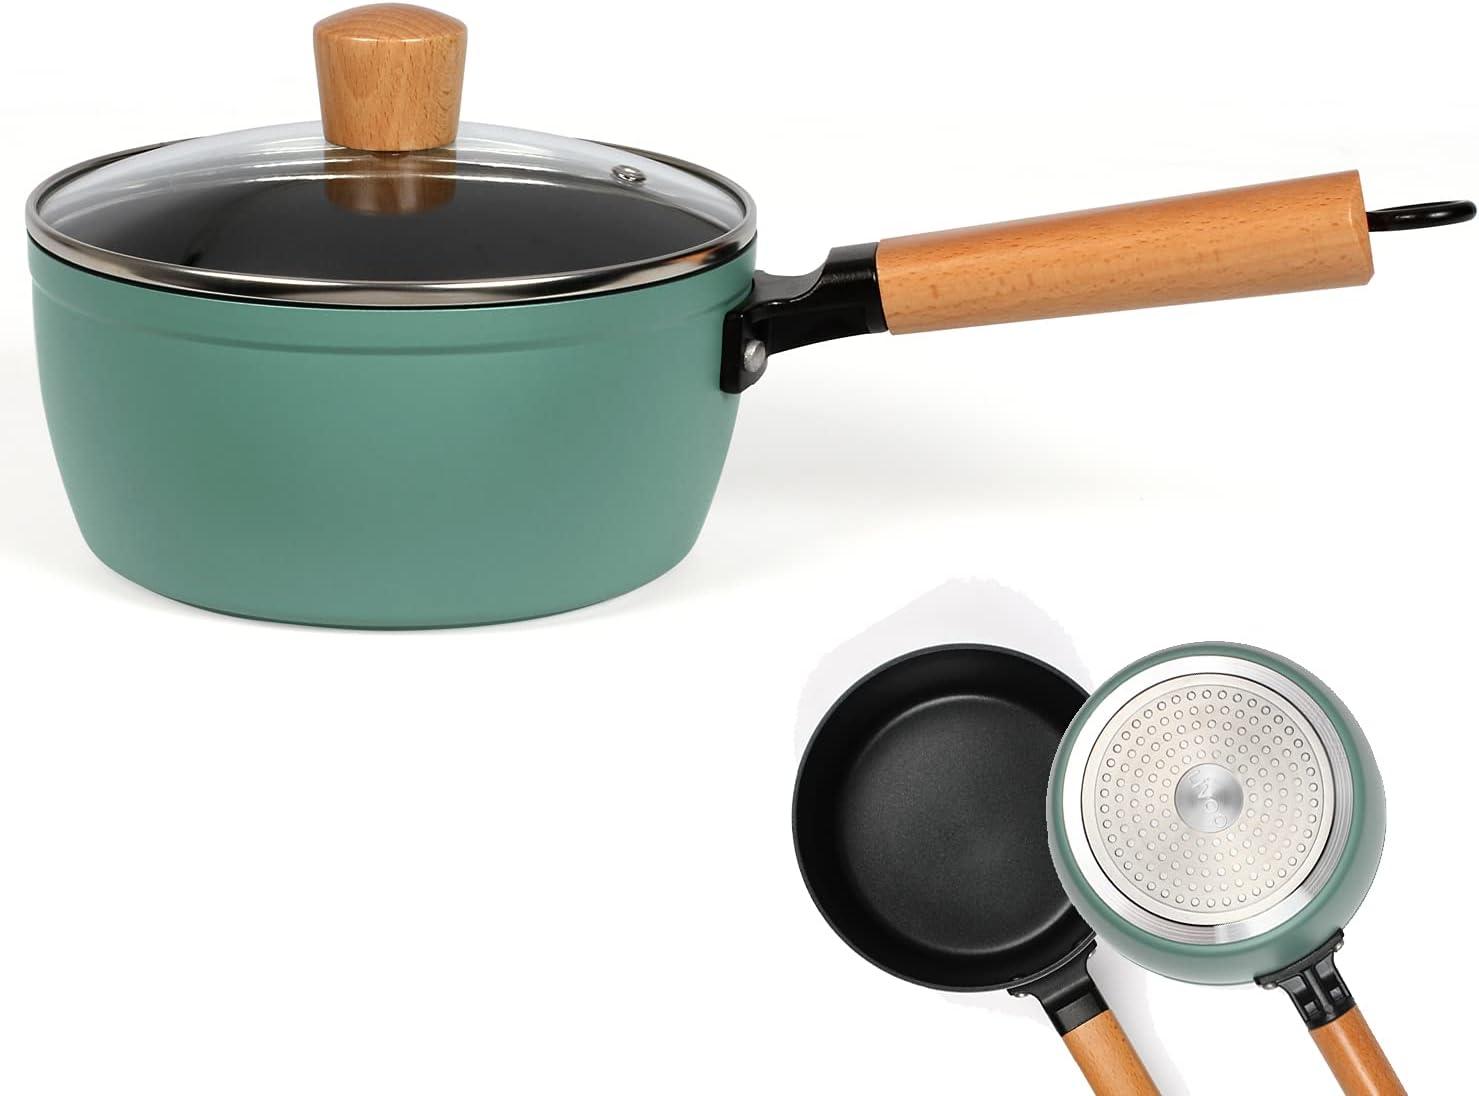 Cazo con tapa de inducción – Cazo pequeño de 18 cm con mango de madera – Cacerola revestida con mango apto para inducción – Cazo de leche con tapa de cristal – Cazo verde